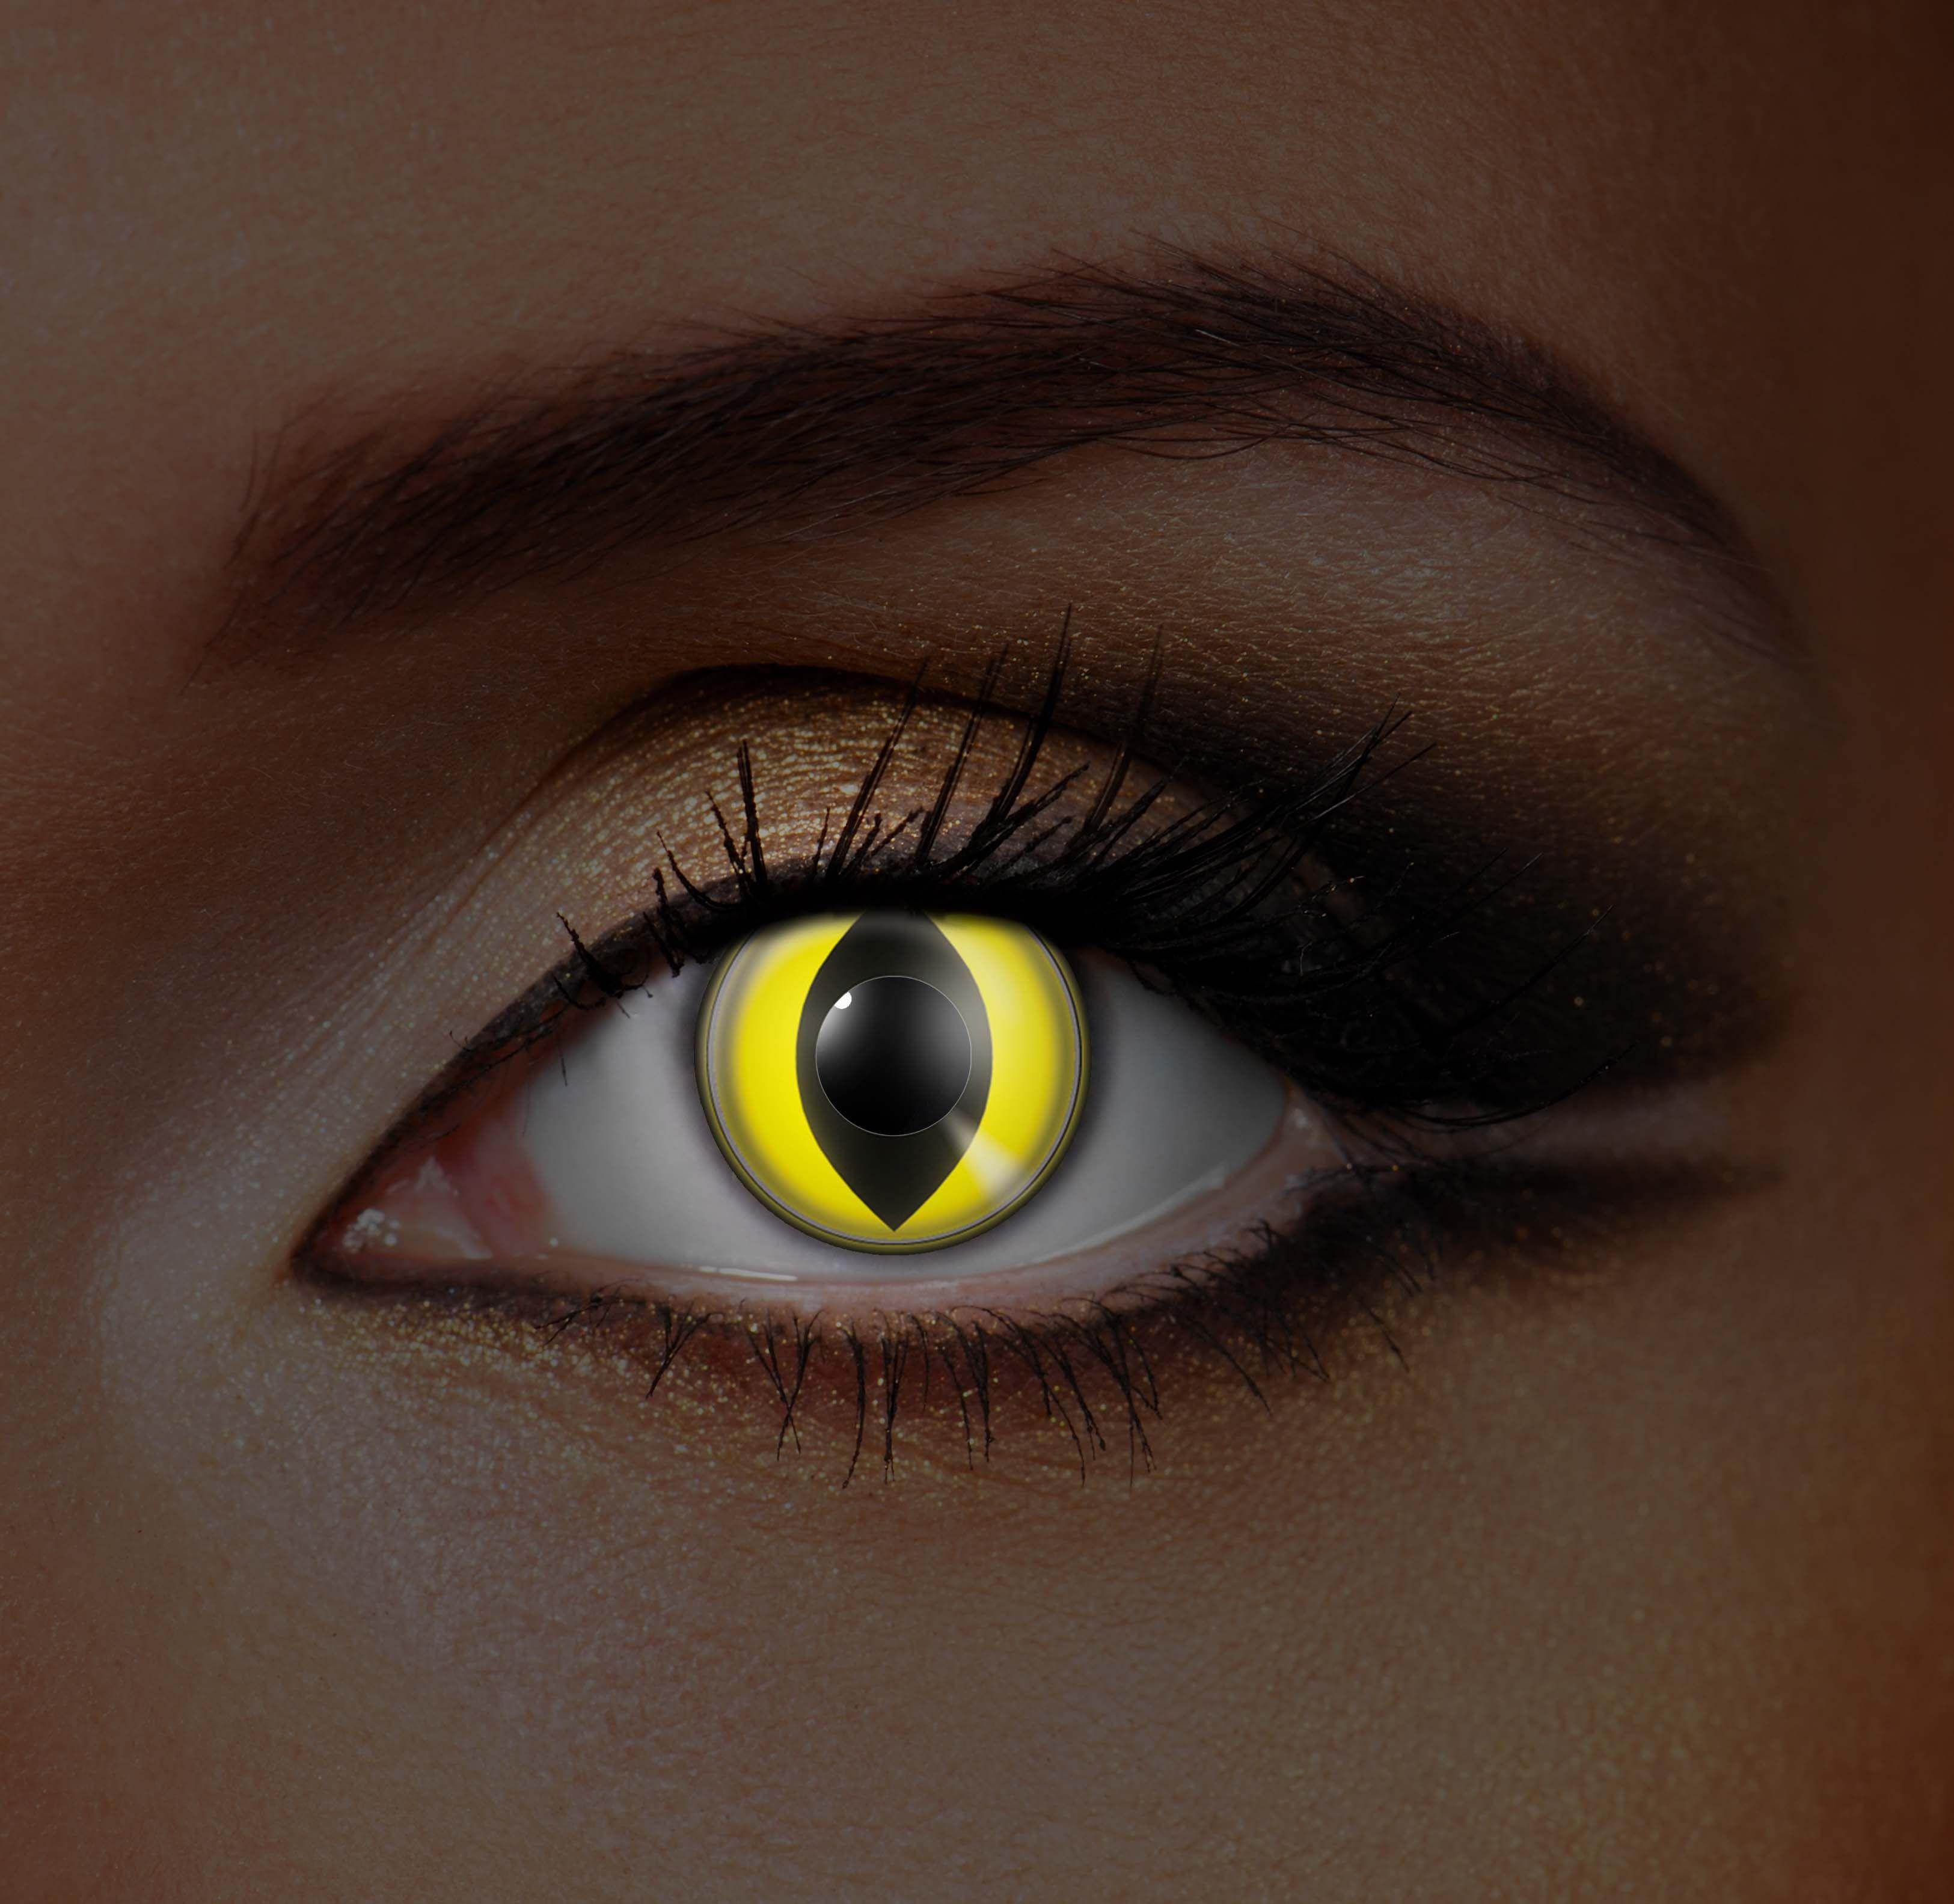 Glowing Yellow Cat Eye Contacts Uv contact lenses, Eye